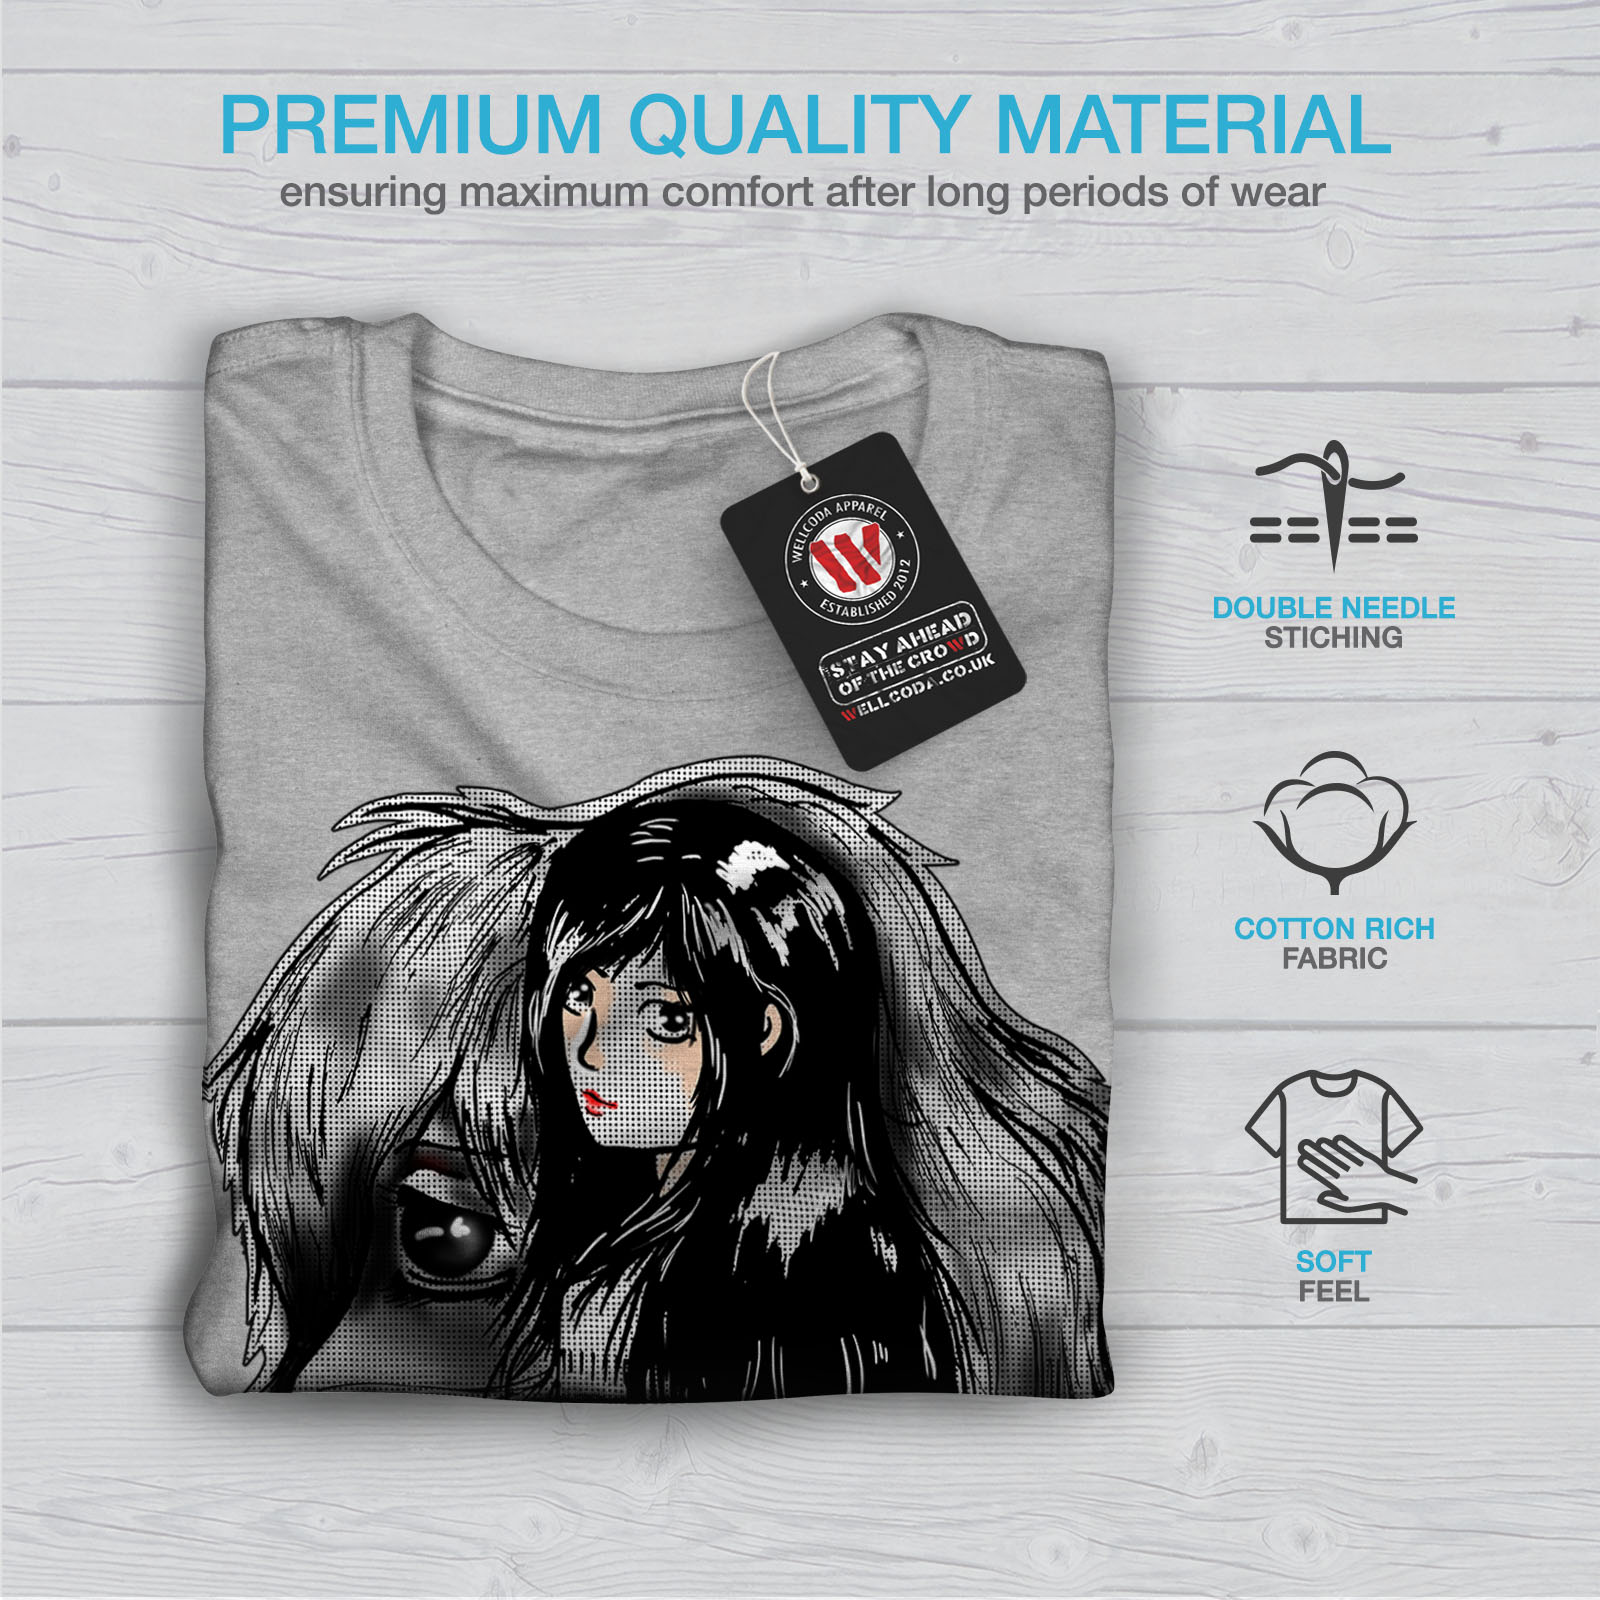 Wellcoda-bellissime-ANIME-Da-Uomo-T-shirt-misterioso-design-grafico-stampato-T-shirt miniatura 19